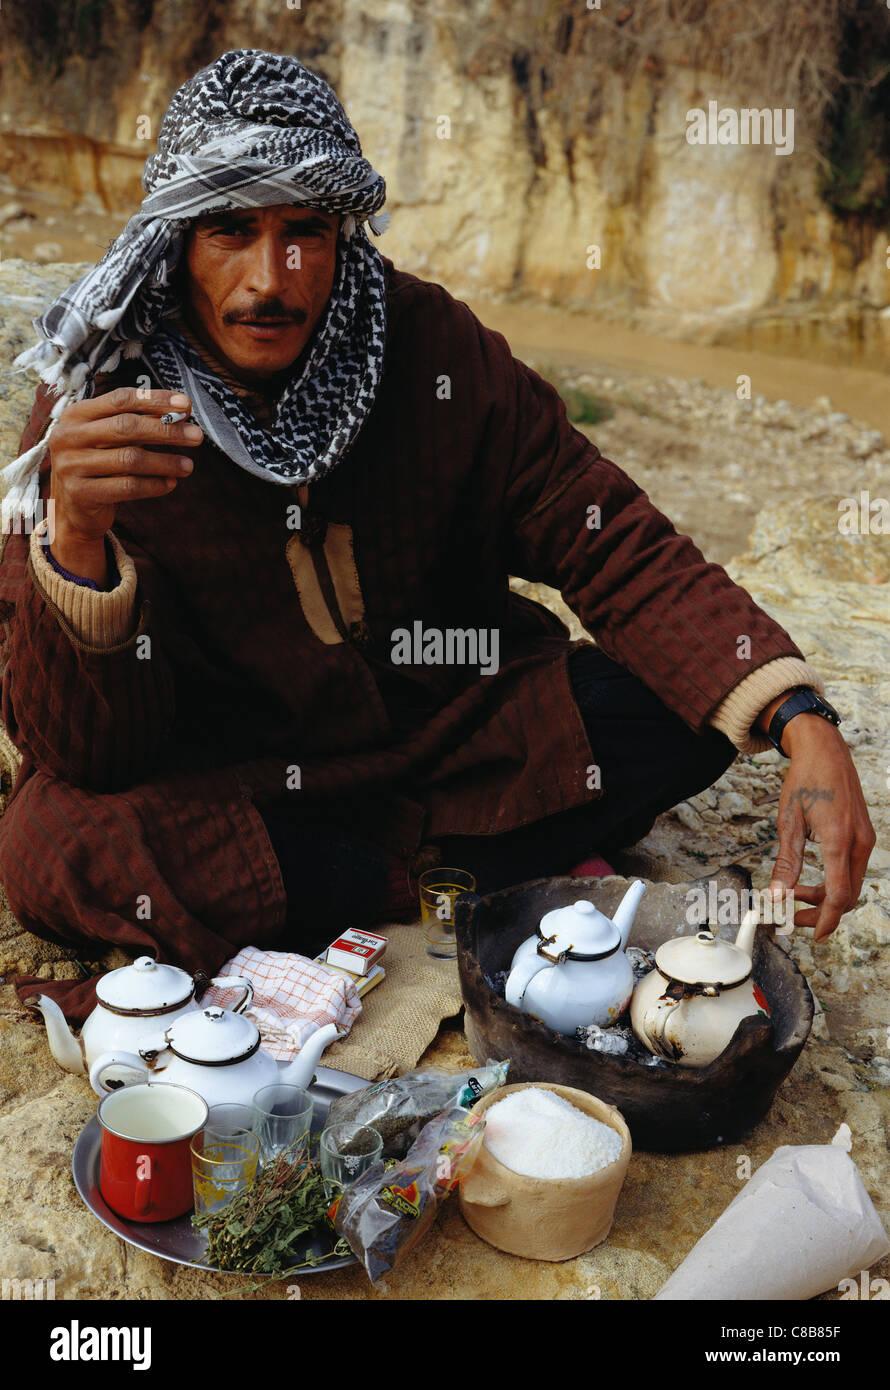 man cross-legged in front of tea - Stock Image